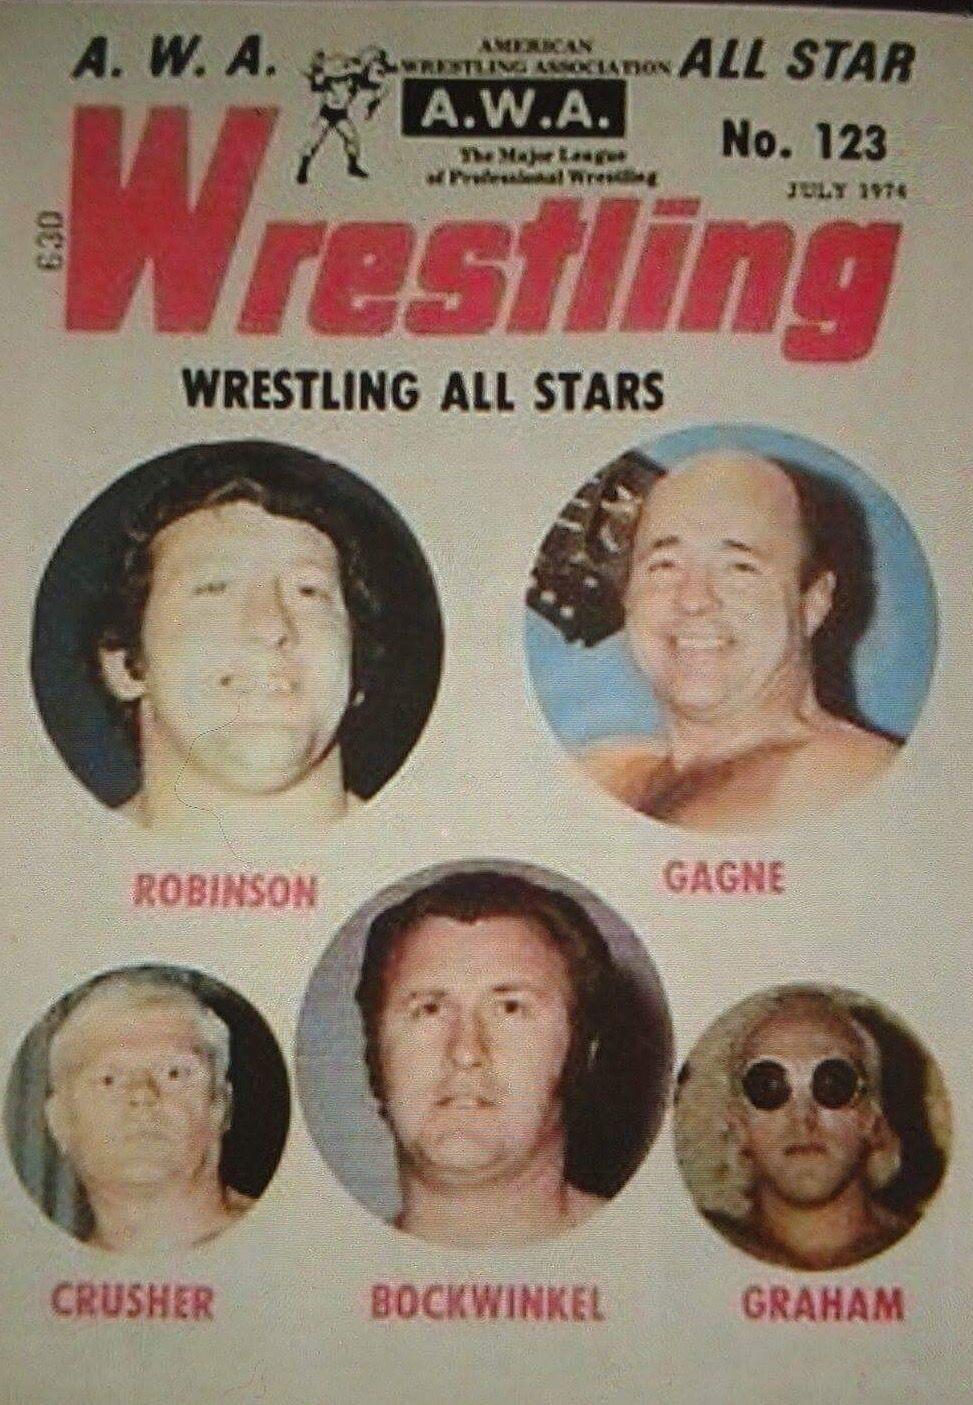 So much pileup vintage pro wrestling logos - So Much Pileup Vintage Pro Wrestling Logos 16